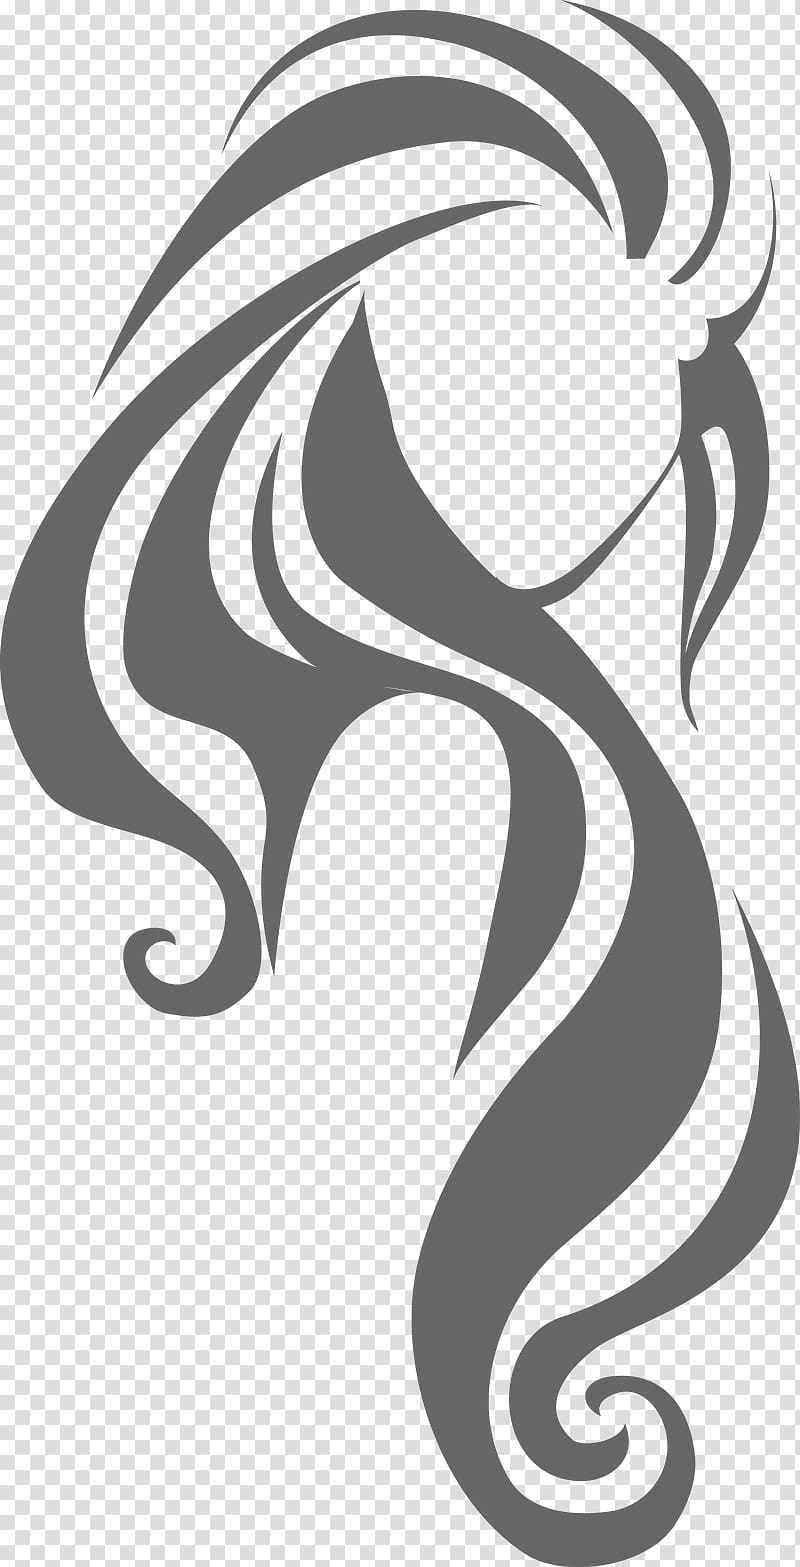 Woman illustration, Hairstyle Long hair Hairdresser, hair salon.